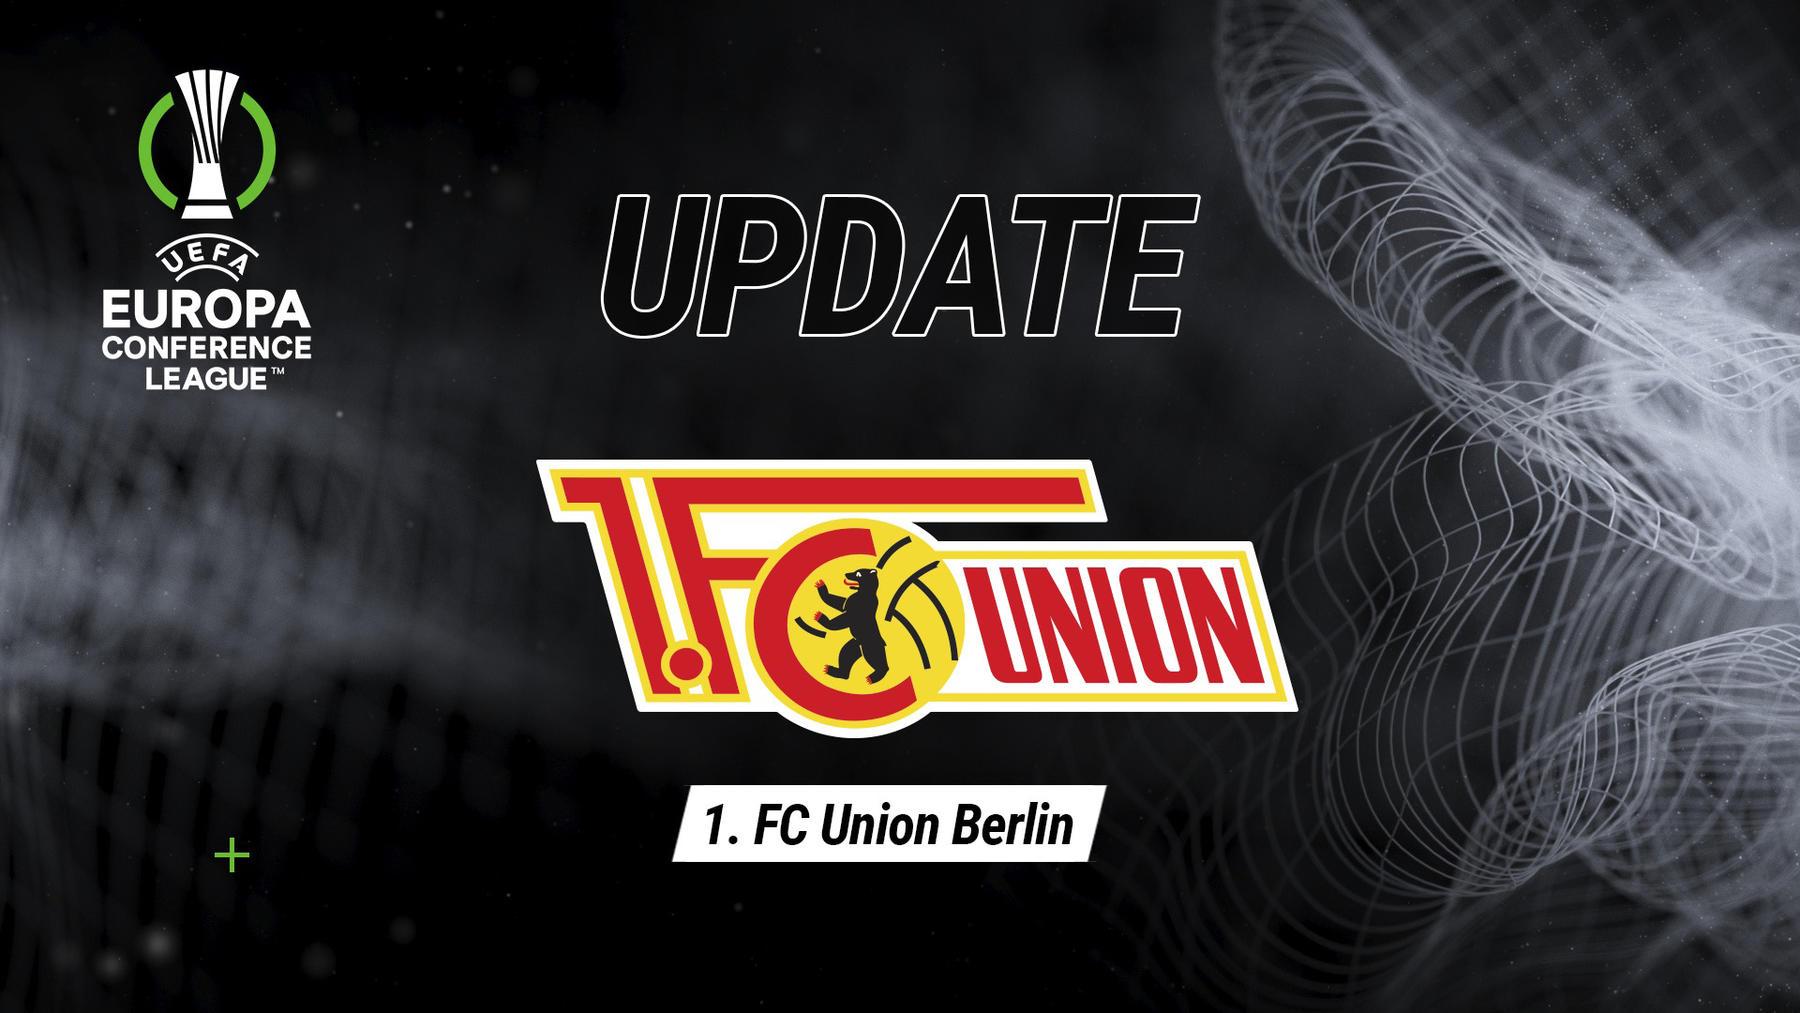 Update 1. FC Union Berlin